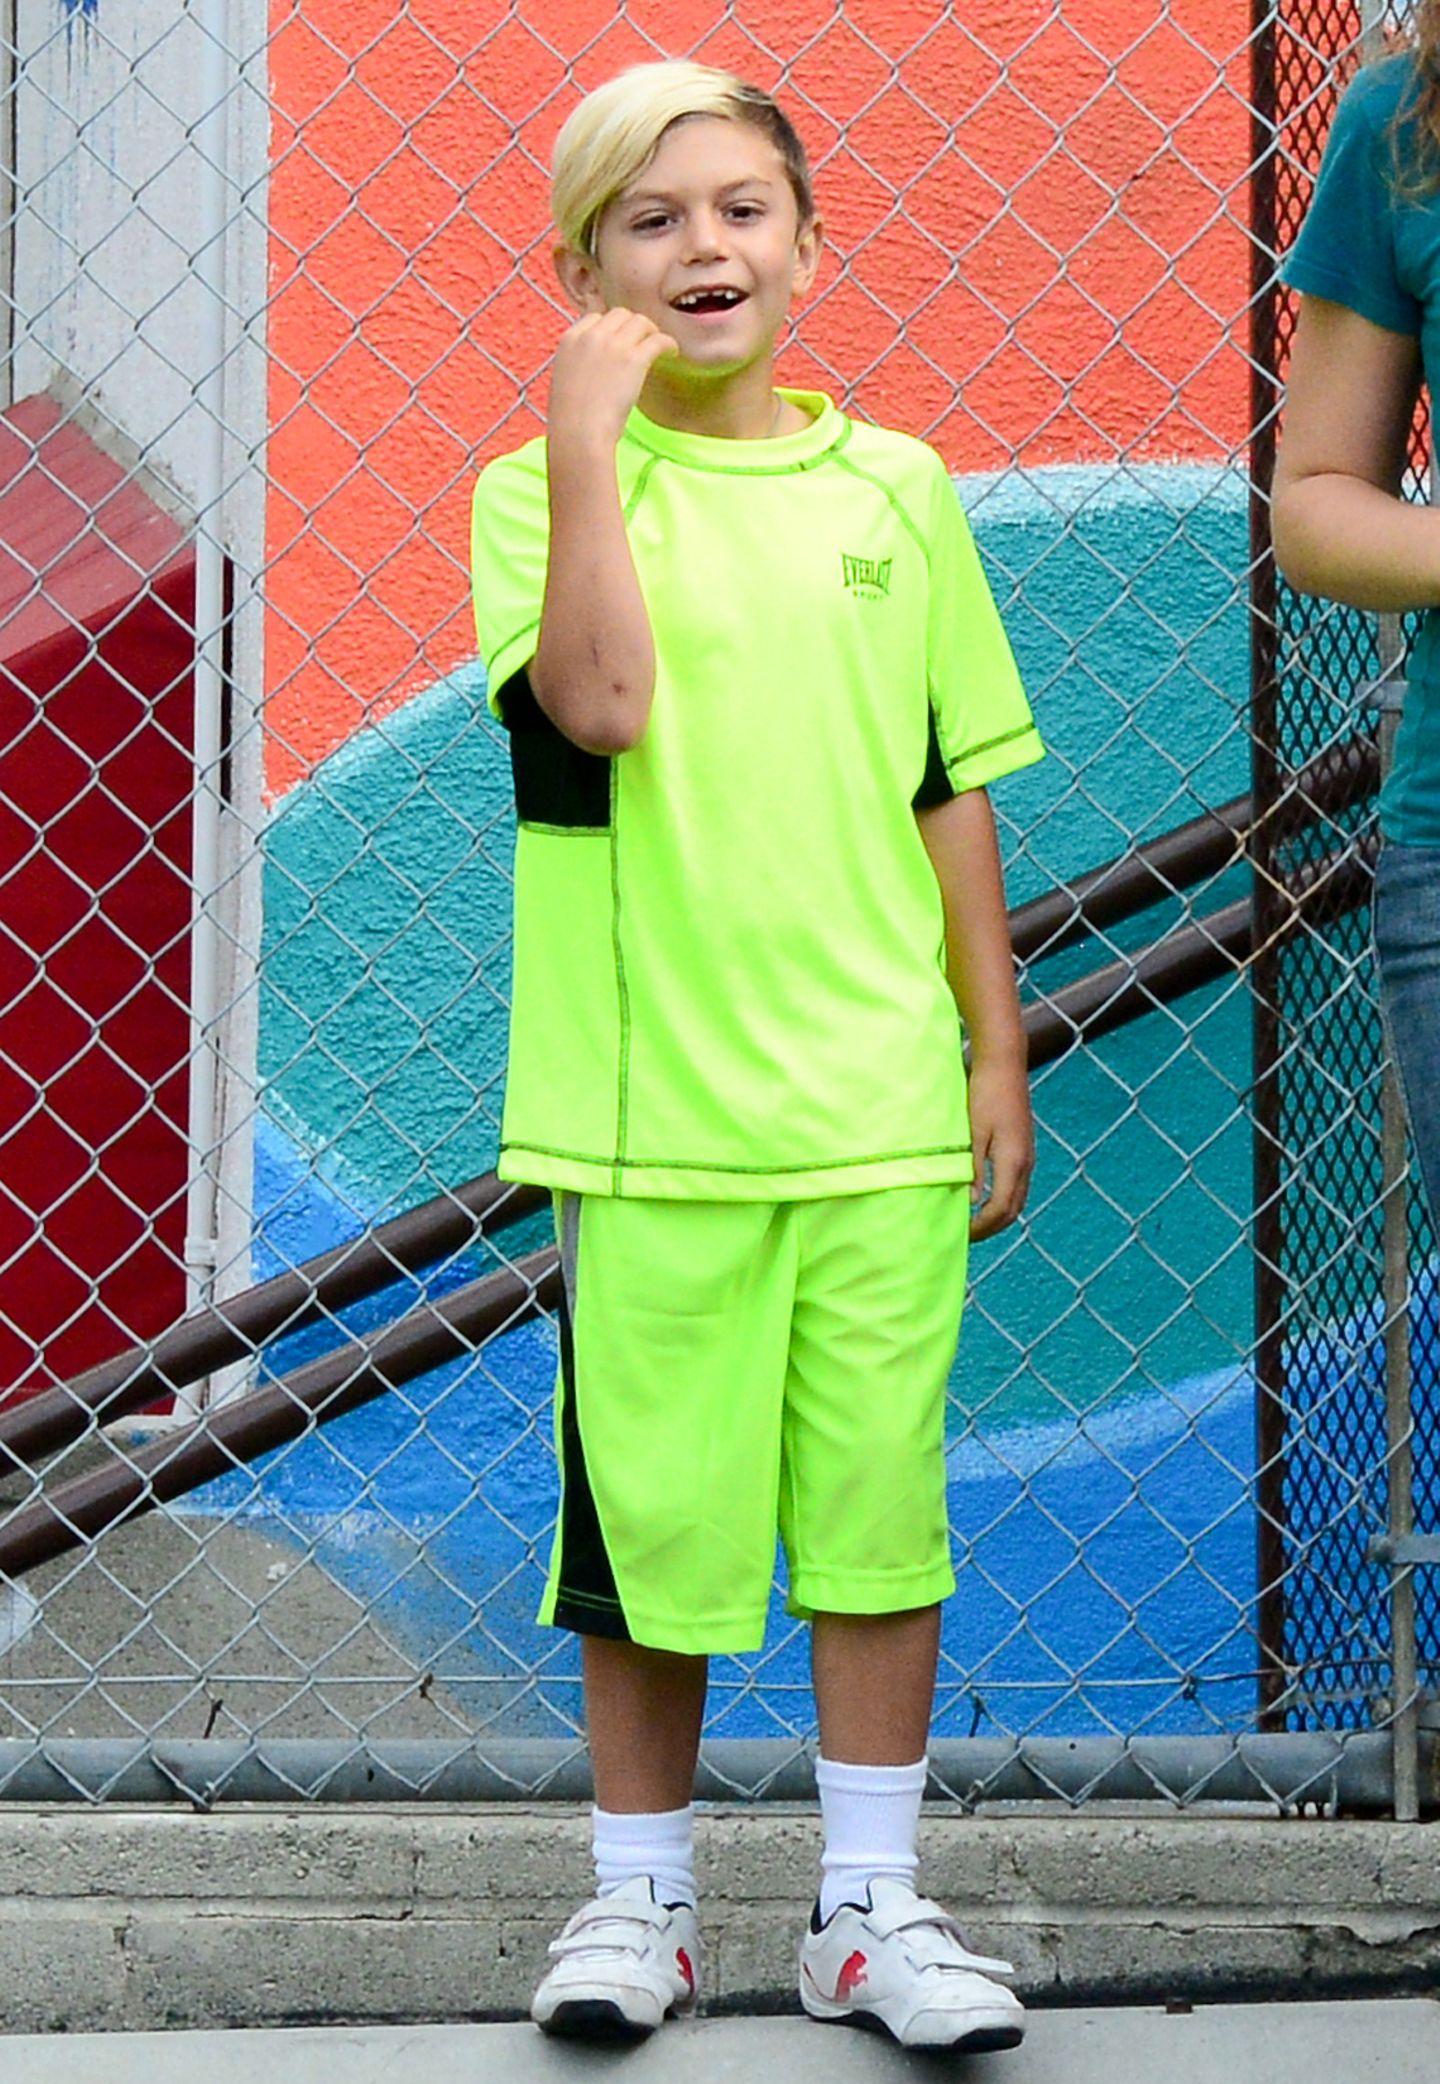 Kingston im normalen Fussball-Trikot? Aber dann bitteschön so auffällig wie möglich in knalligem Neongrün!